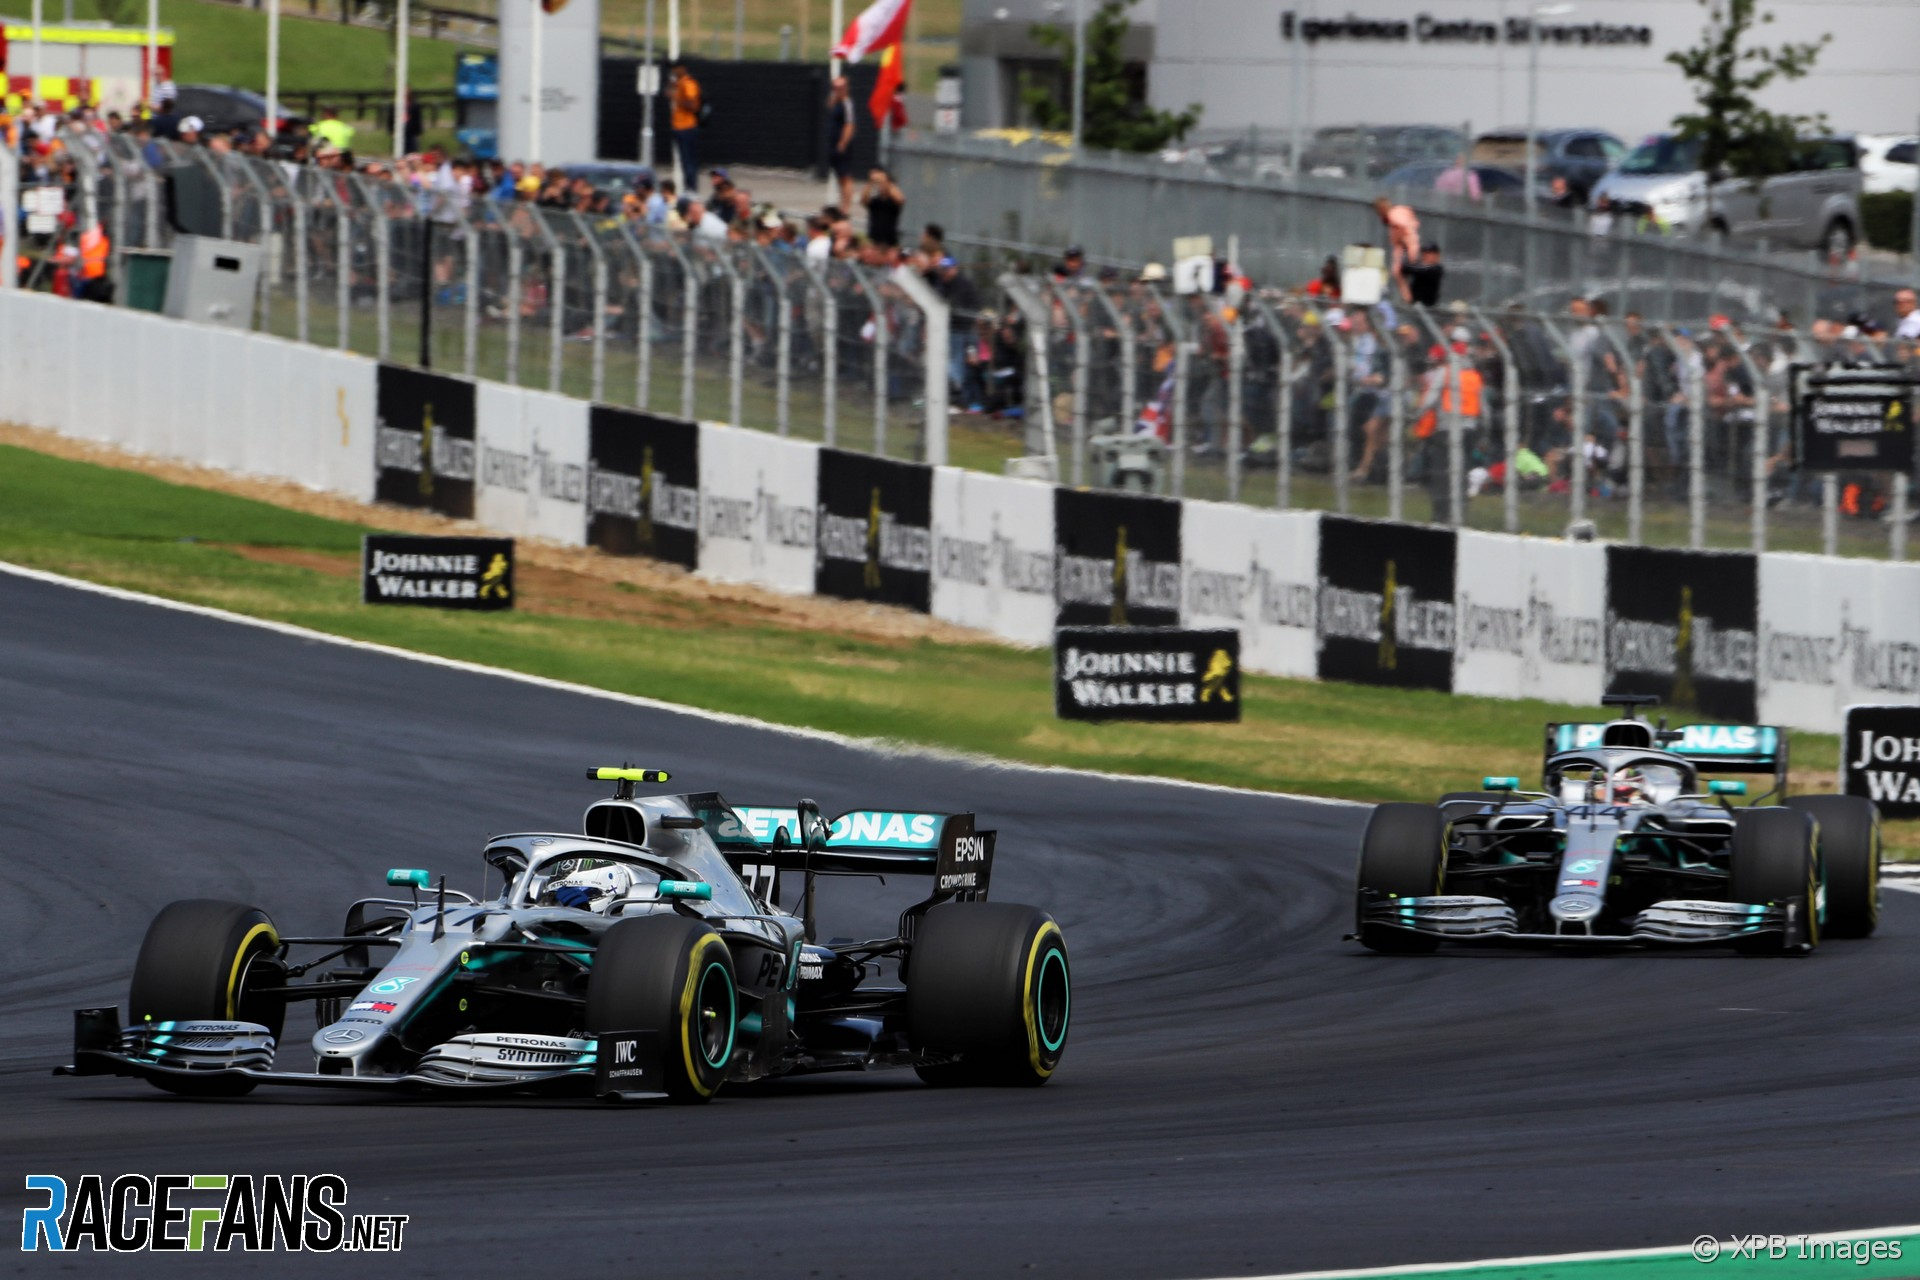 Valtteri Bottas, Lewis Hamilton, Mercedes, Silverstone, 2019